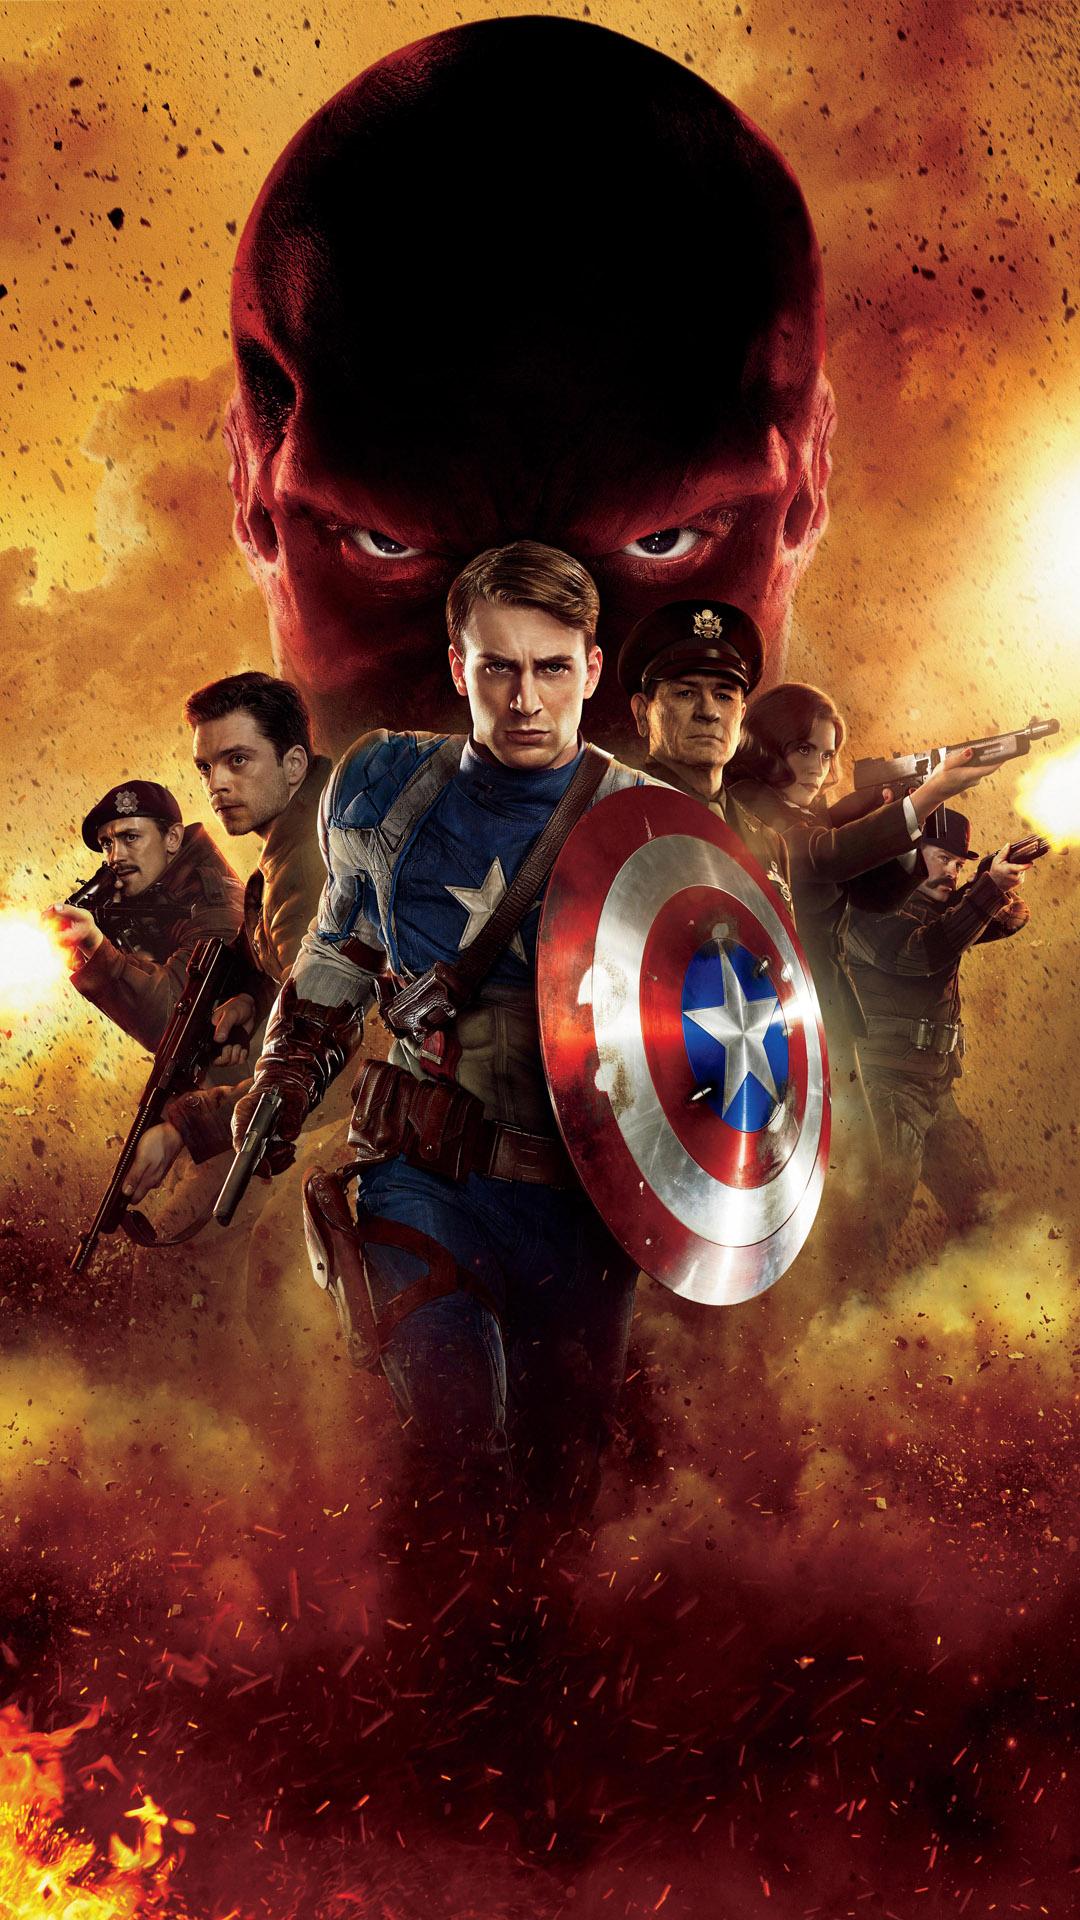 Captain America attack